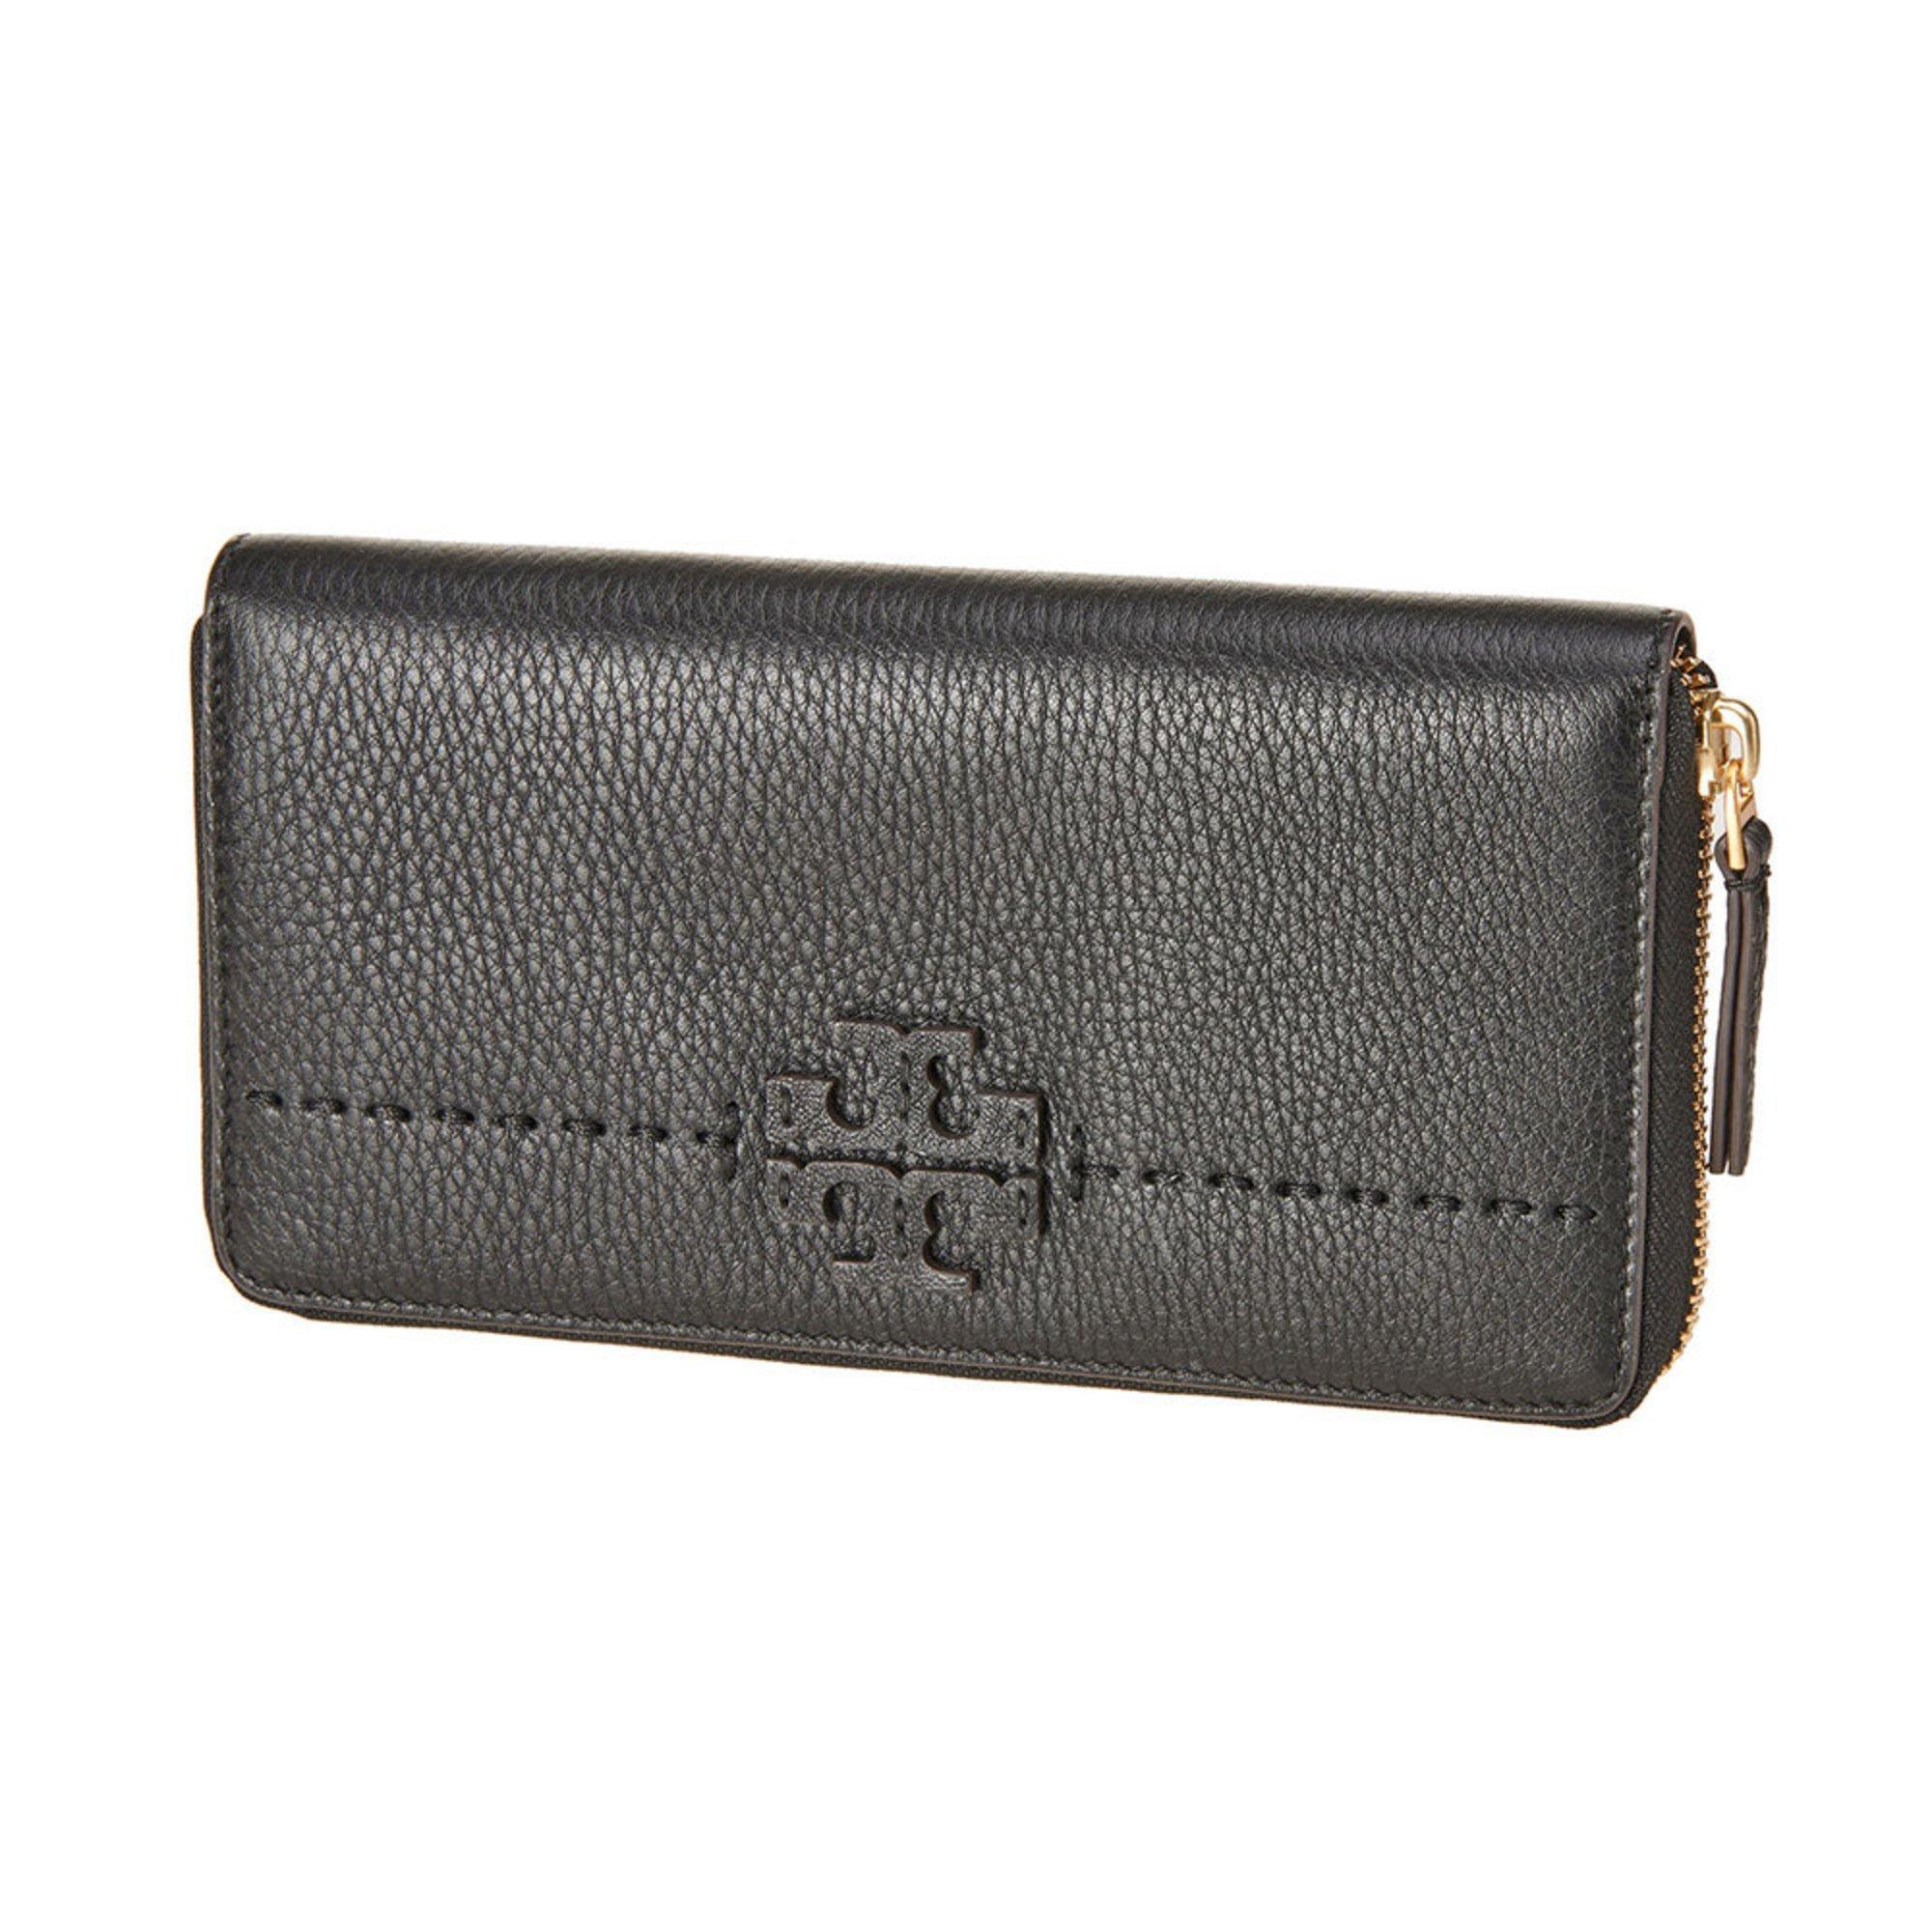 6658ed32c8 Tory Burch Mcgraw Zip Continental Wallet Black